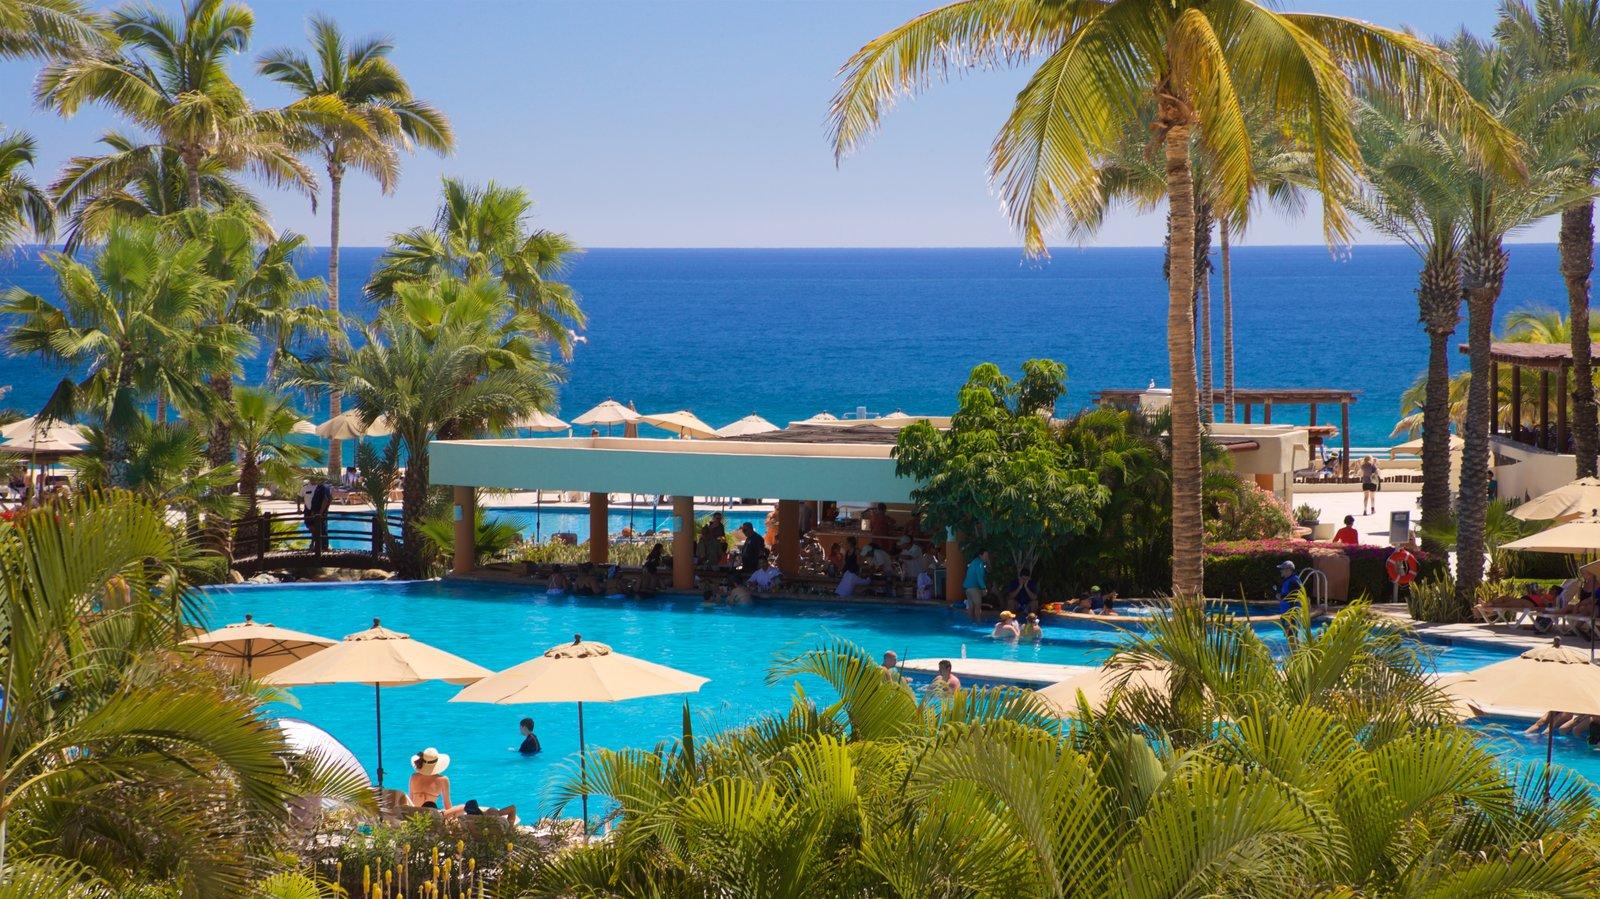 Zona Hotelera showing a hotel, tropical scenes and general coastal views